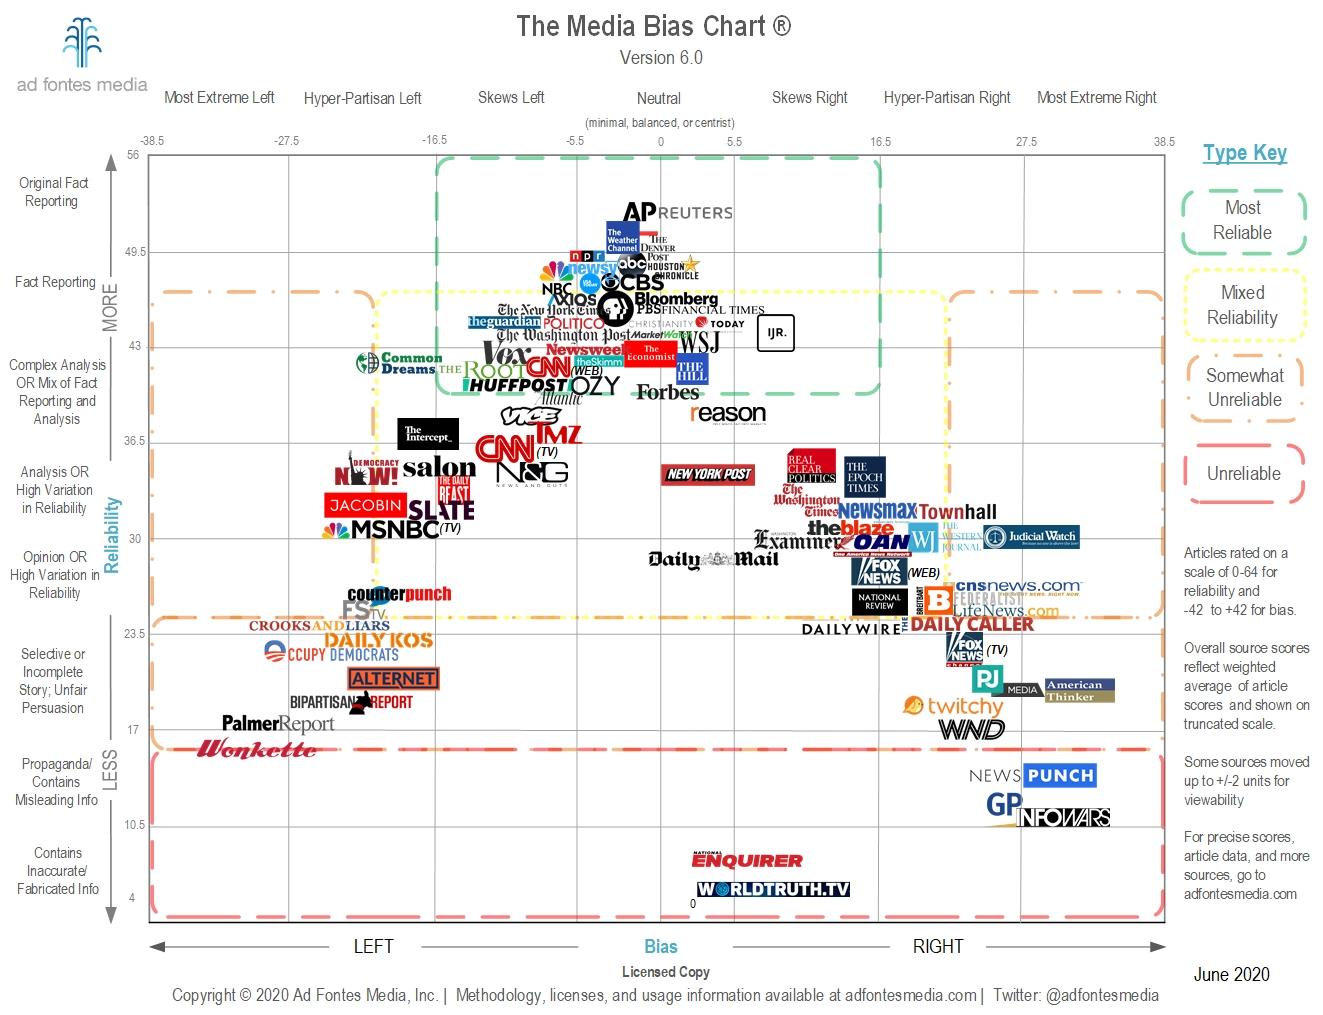 Media Bias Chart - retrieved from https://www.adfontesmedia.com/